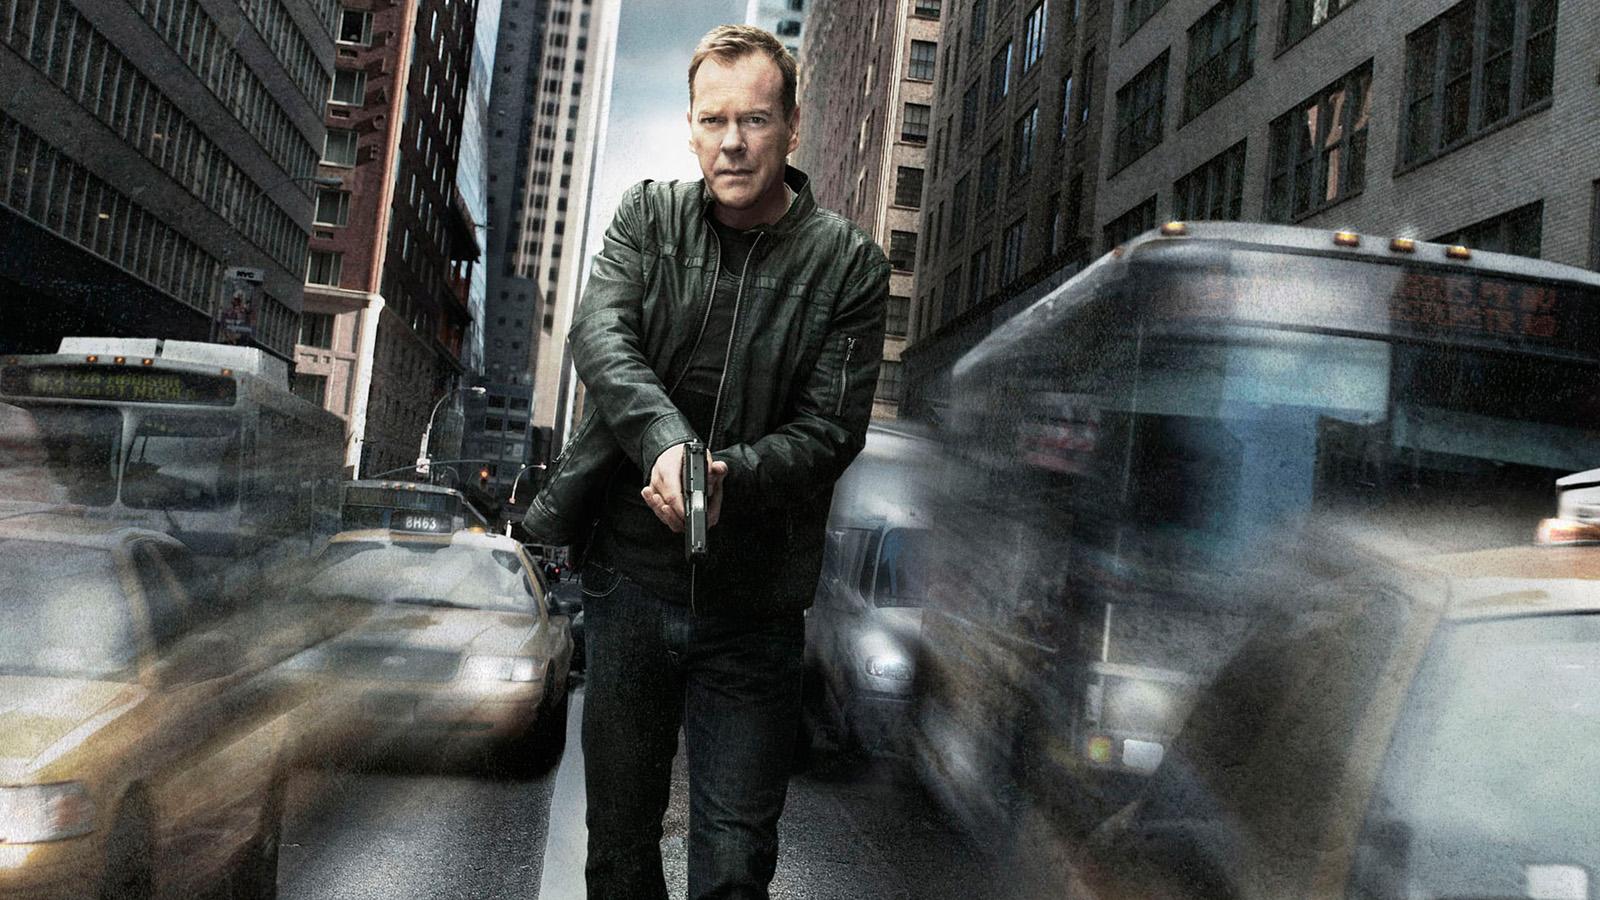 24 Legacy S1e2: 24 Legacy: Howard Gordon Clarifies Chances Of Jack Bauer